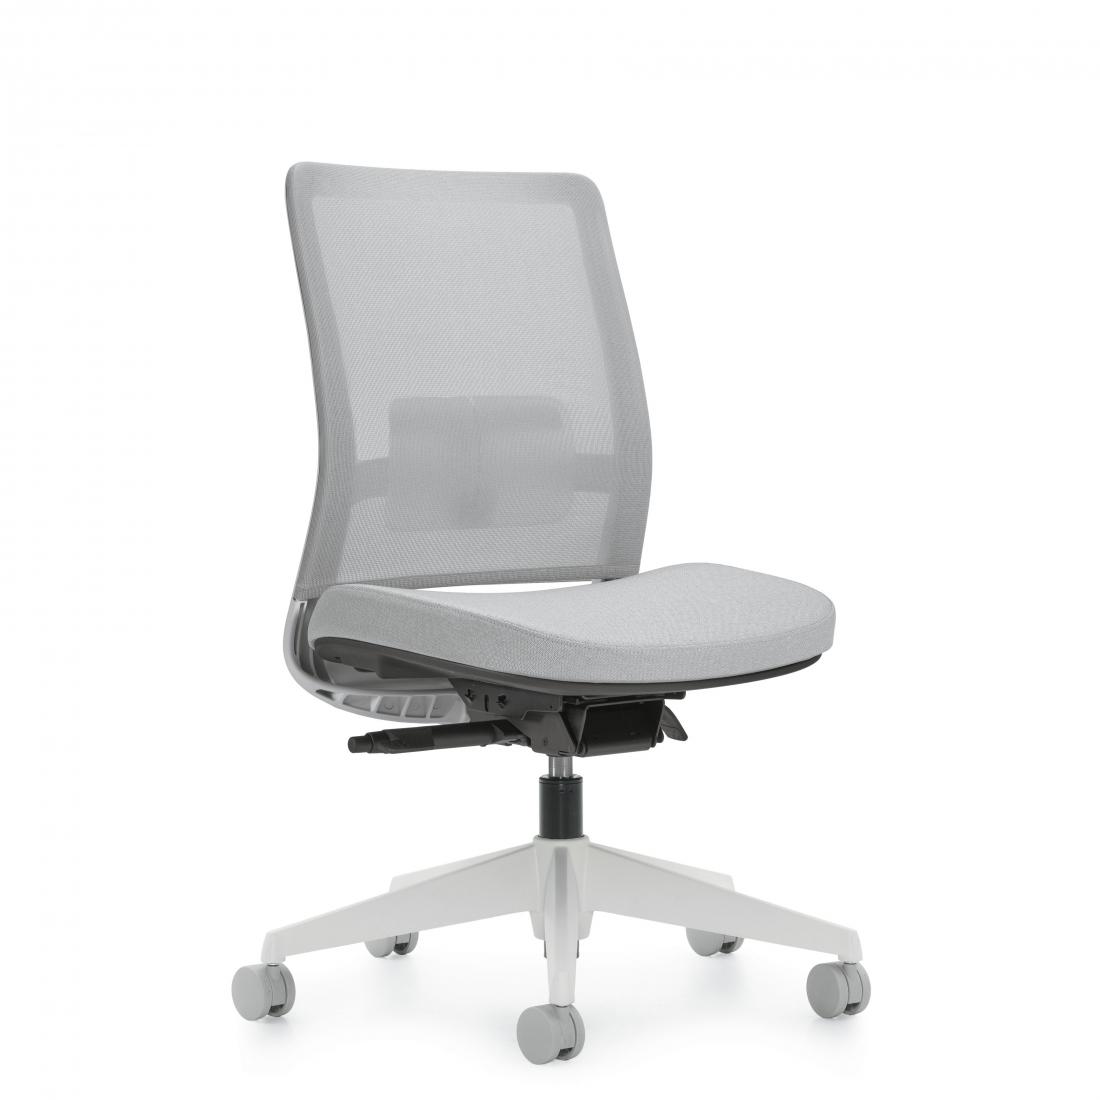 Fine Global Factor Series Armless Mid Back Mesh Chair 5541Na Inzonedesignstudio Interior Chair Design Inzonedesignstudiocom